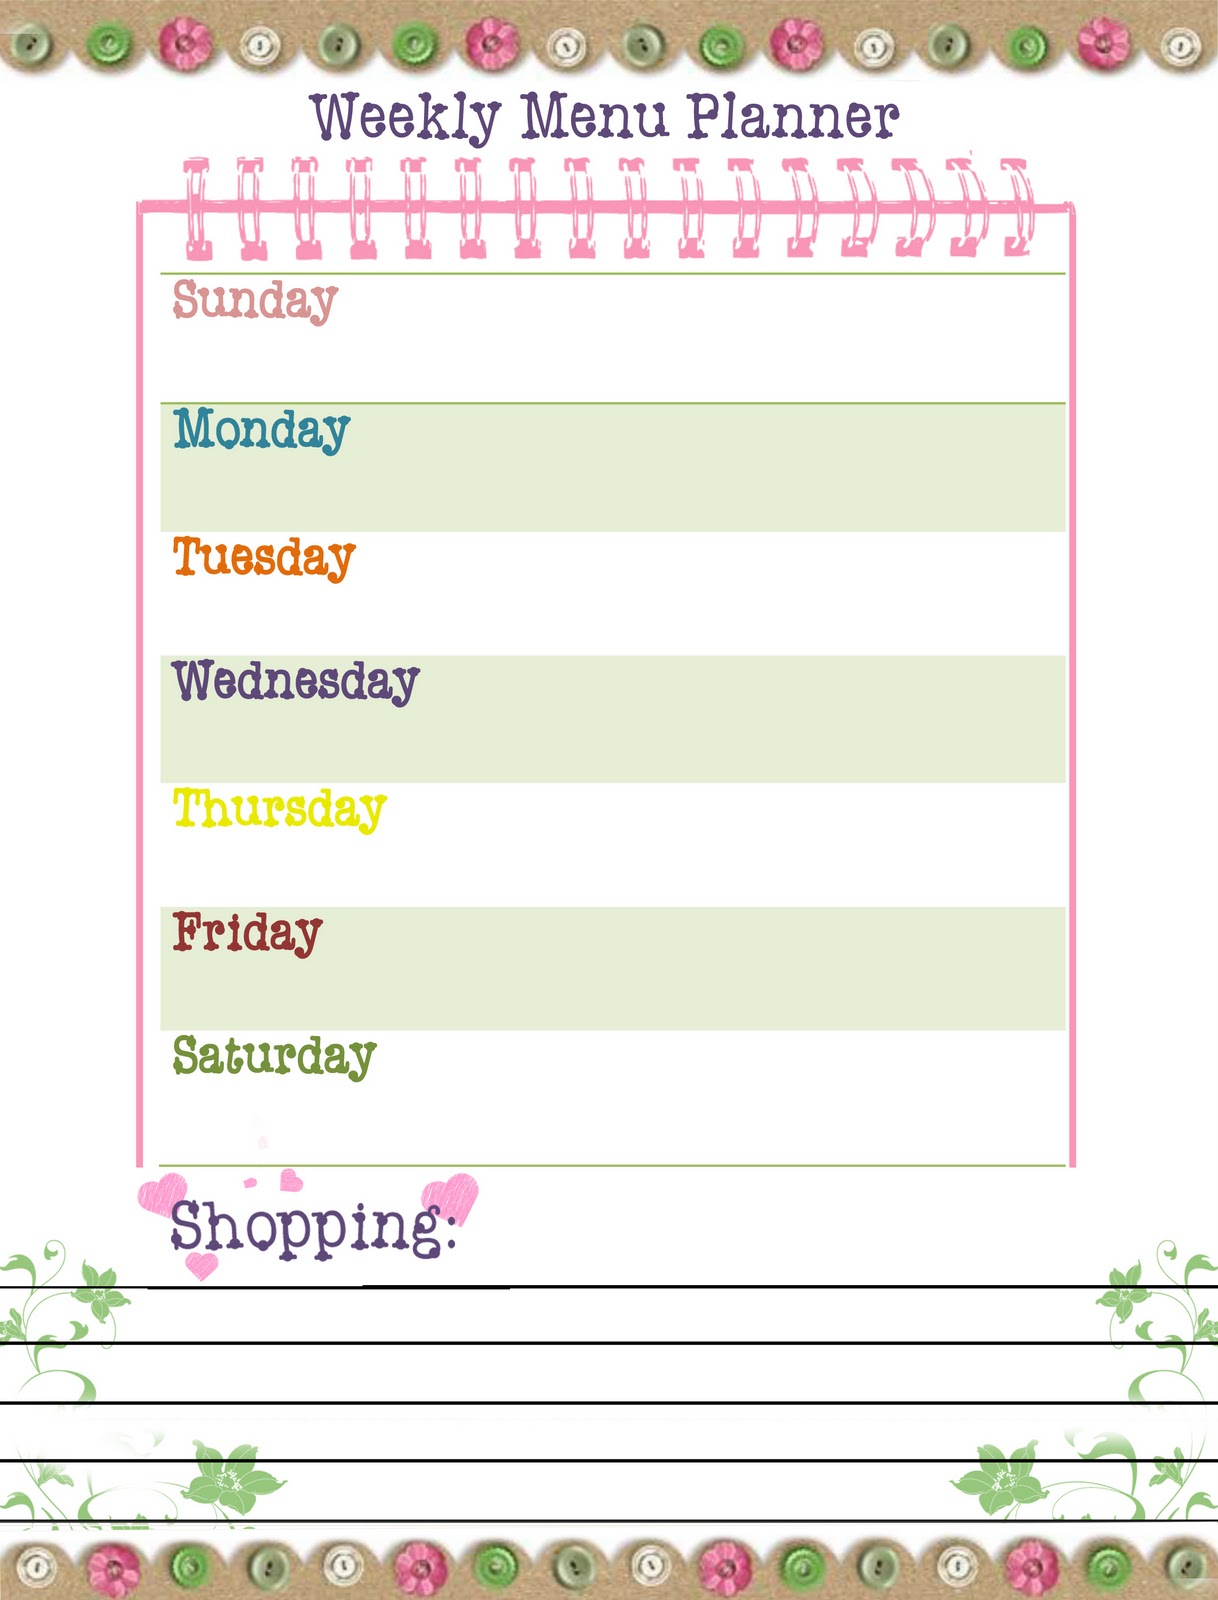 Our Way To Learn Weekly Menu Planner Free Printable